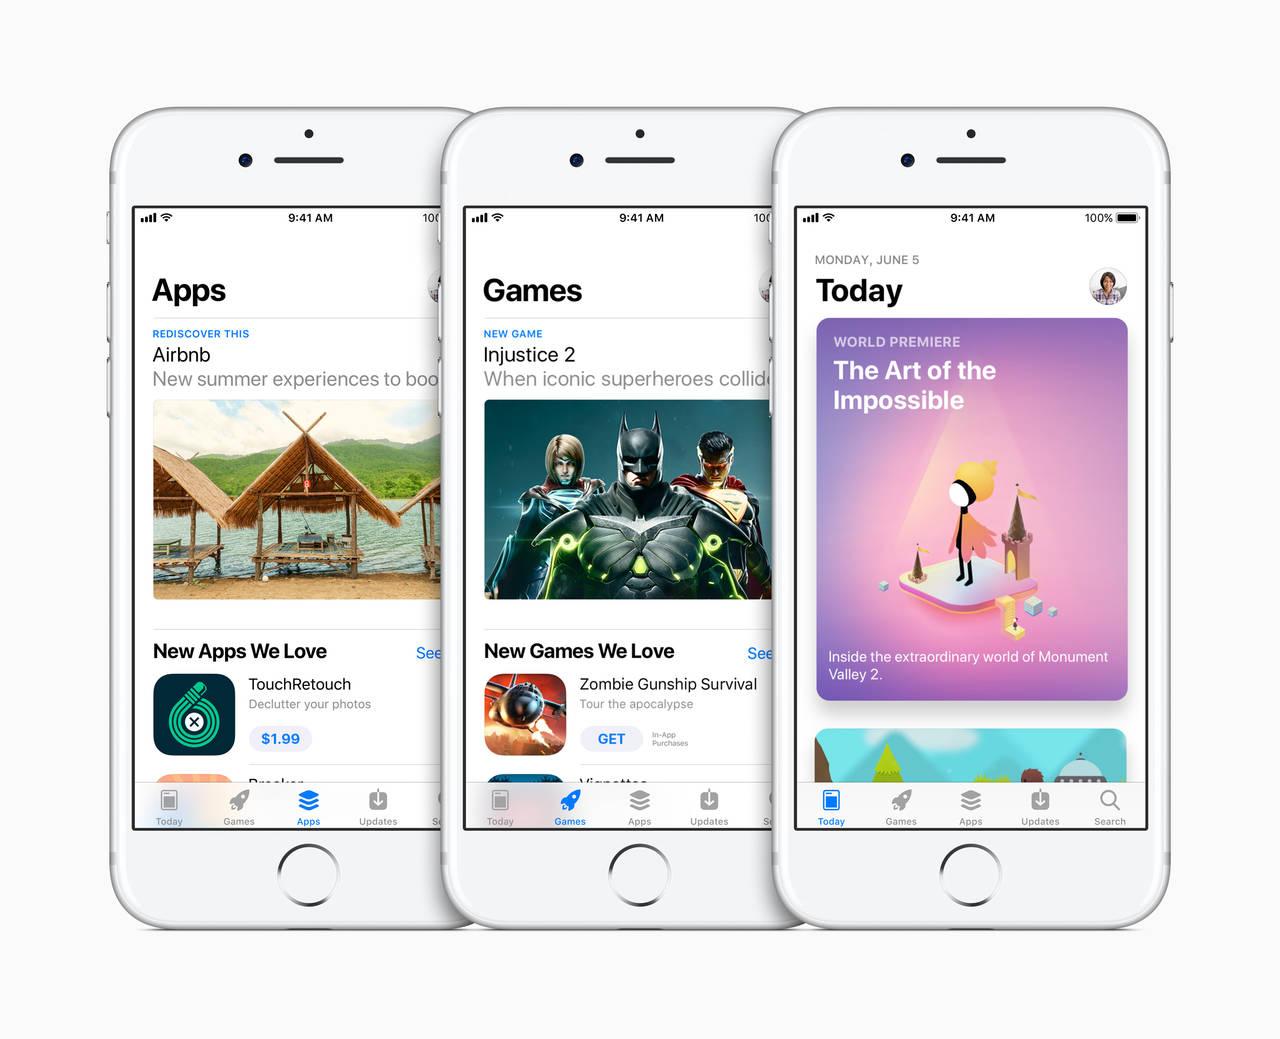 Nuovo app store WWDC 2017